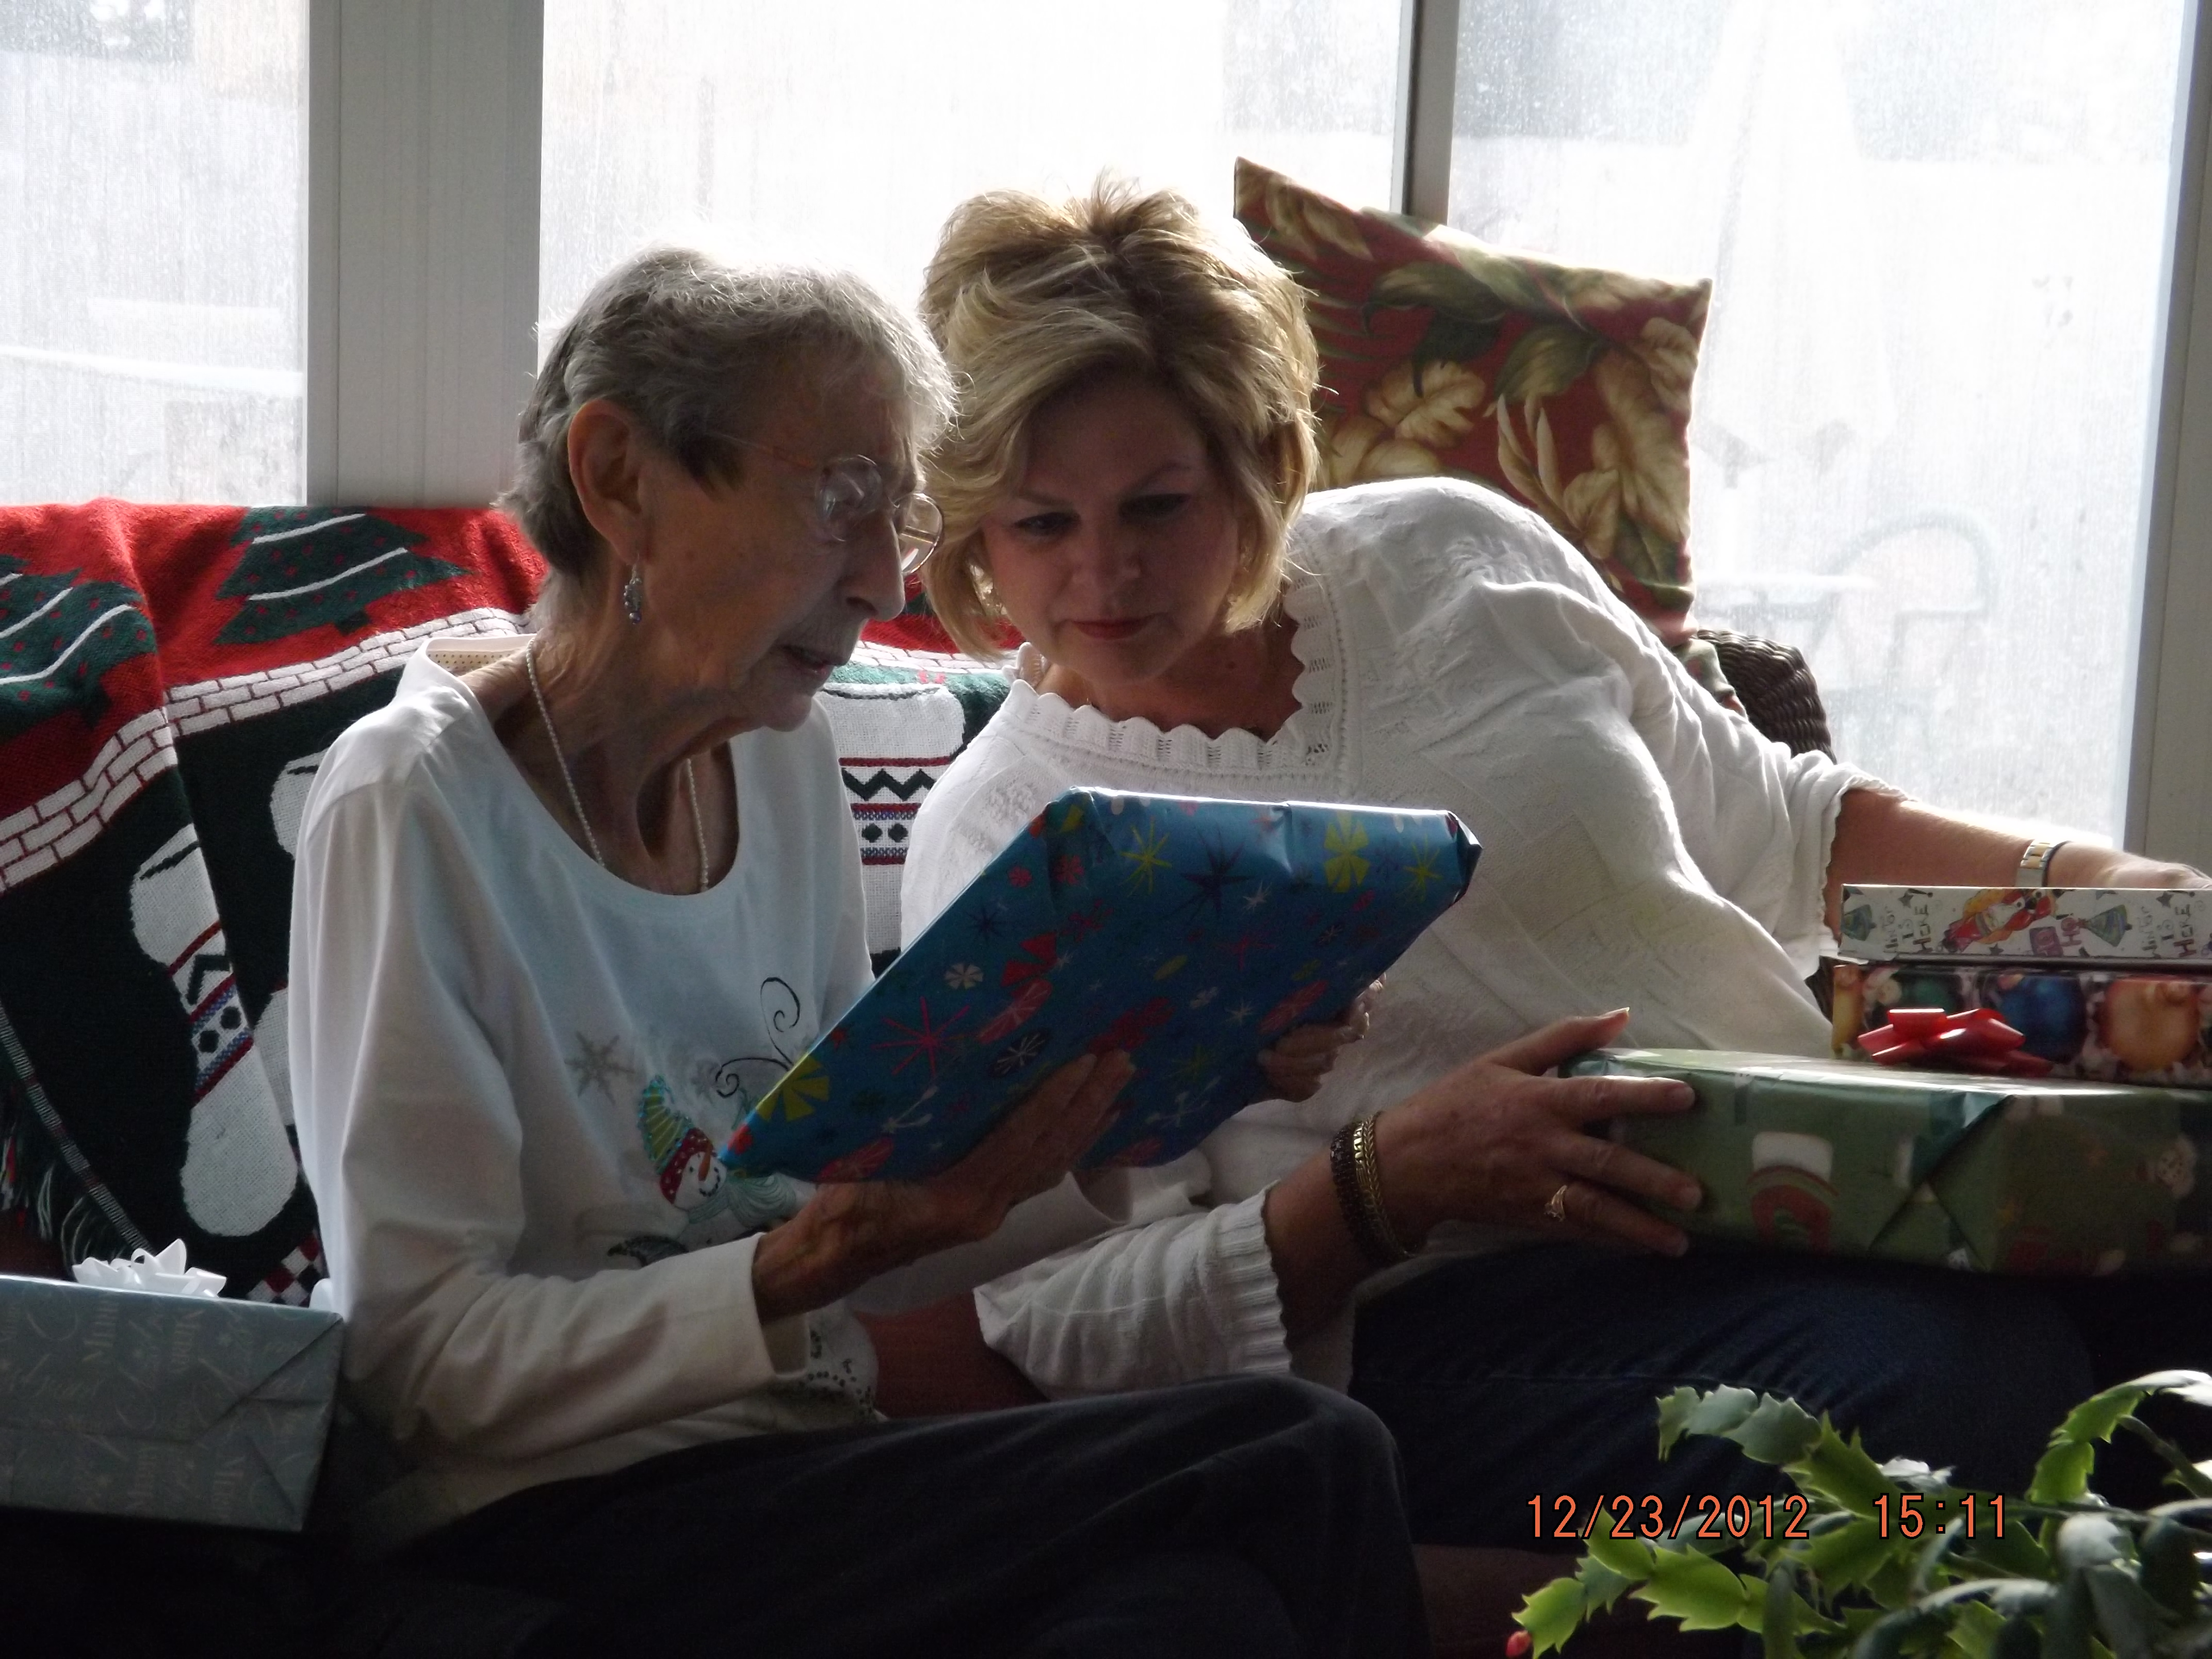 Linda & Doris exchanging Christmas presents.